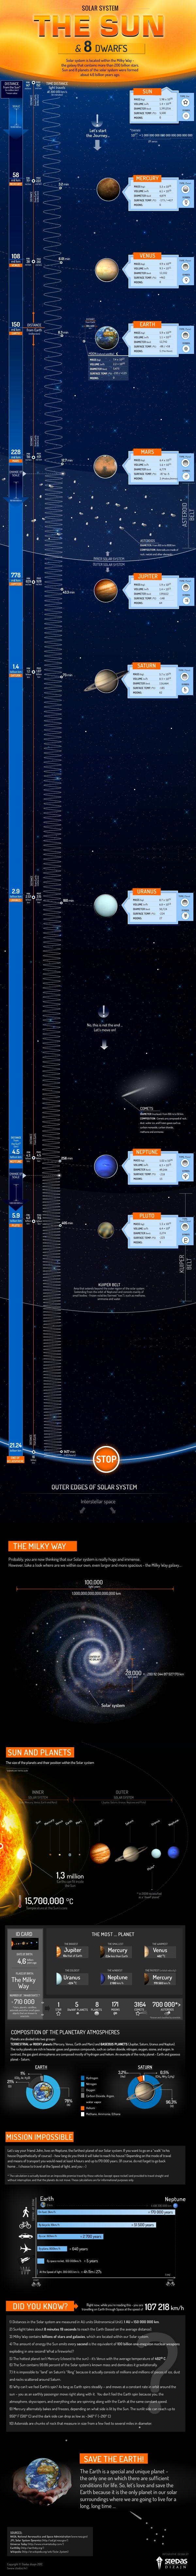 Solar system. The sun & 8 dwarfs #infographic